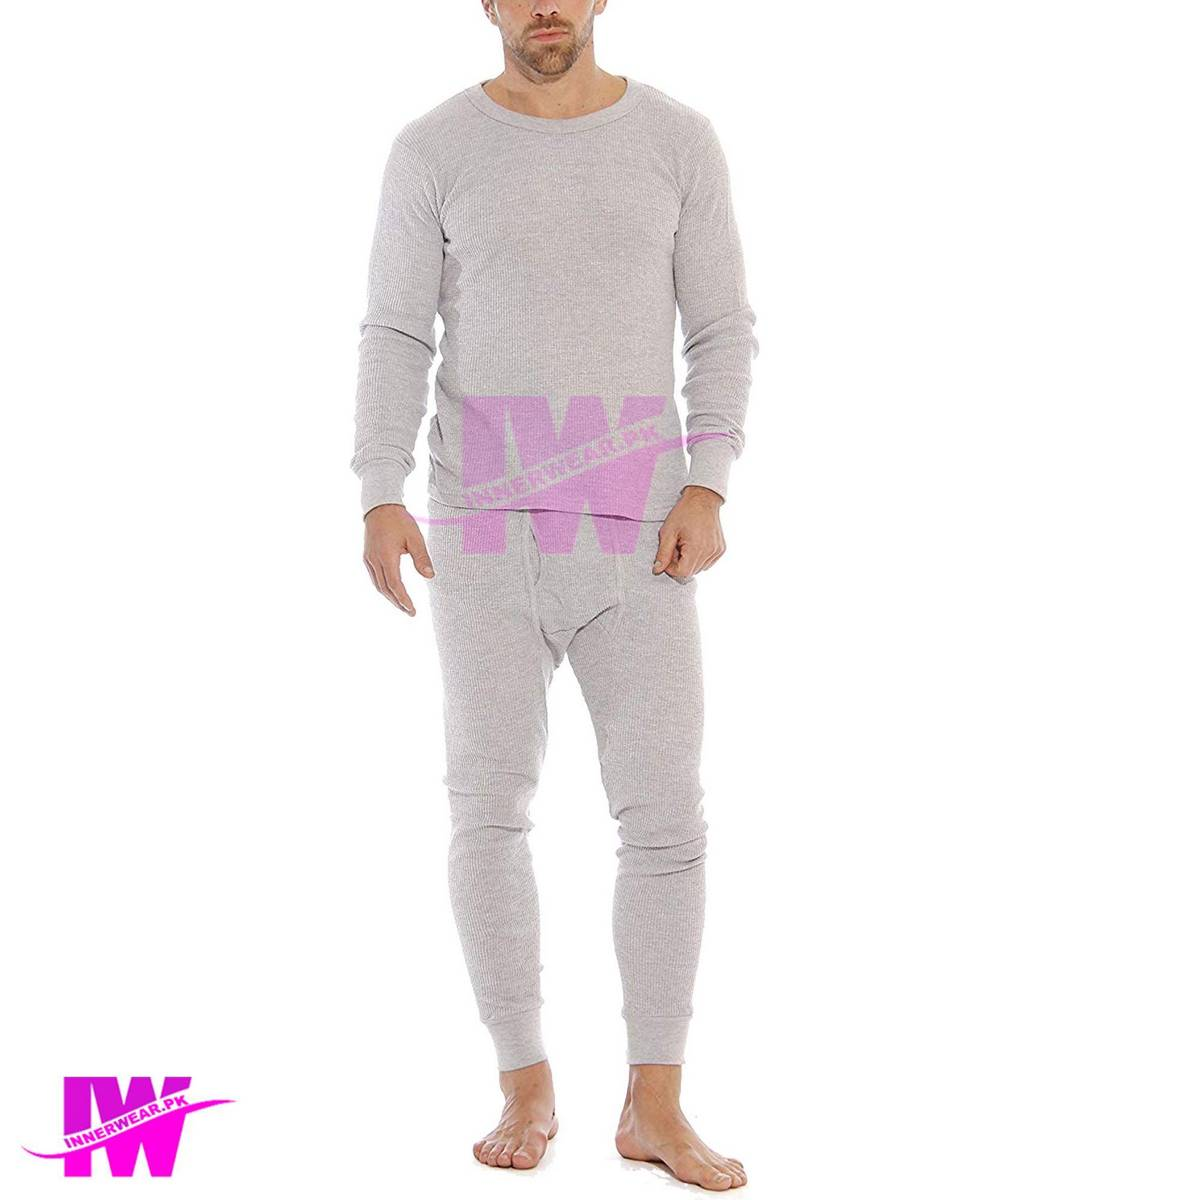 Men Premium Full Body Suit Thermal Body Warmer Skin Tight Stretchable Innerwear Winter Warm Long Johns Trouser Pajama Full Sleeve Shirt Light Grey / Silver Full Bazoo 2nd Skin innerwear pk